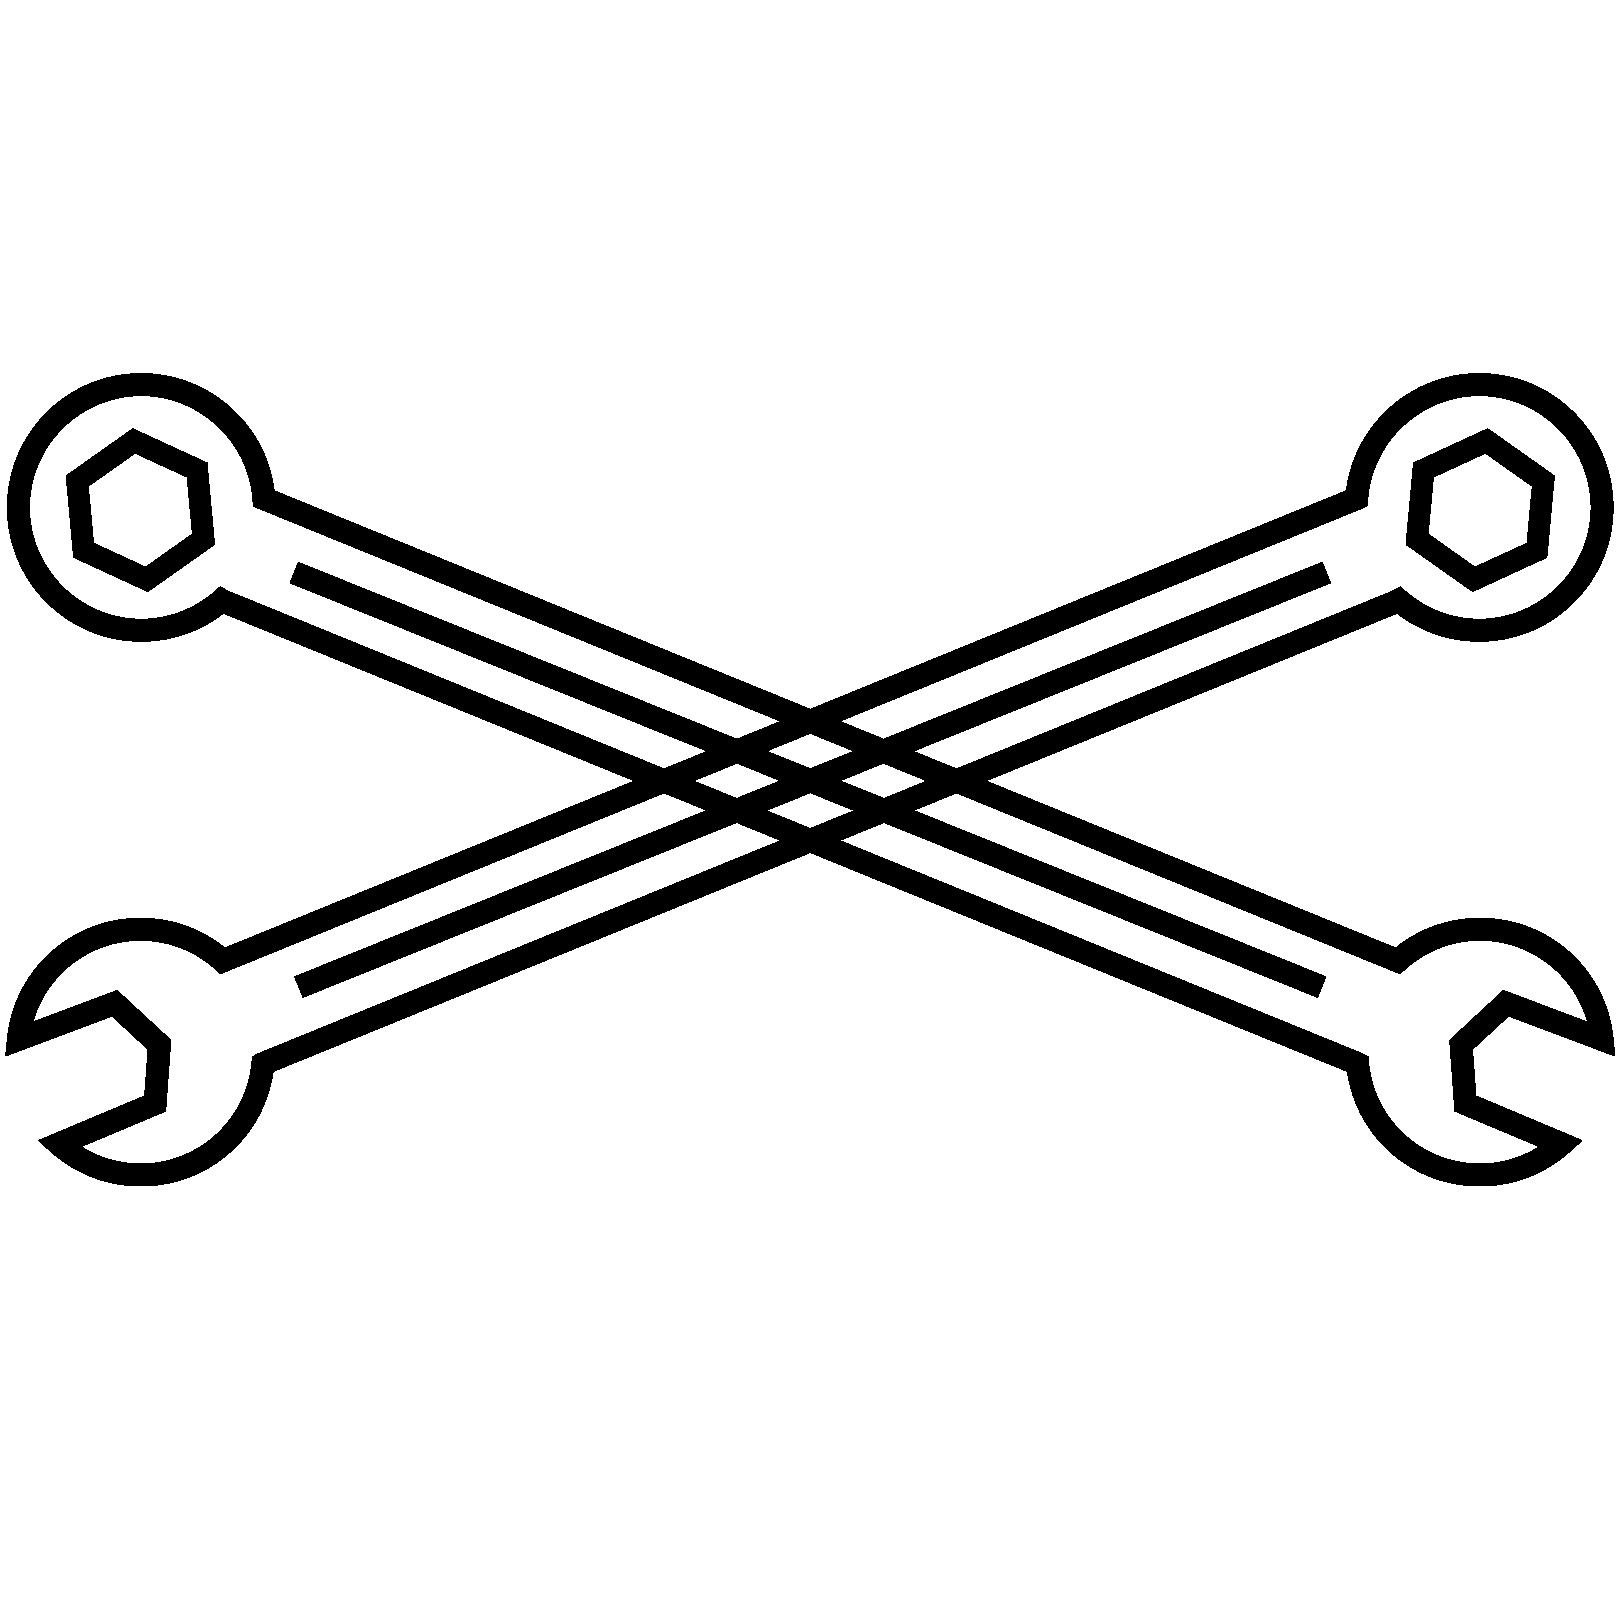 Trade Up Co - Logo-Favicon-02.png